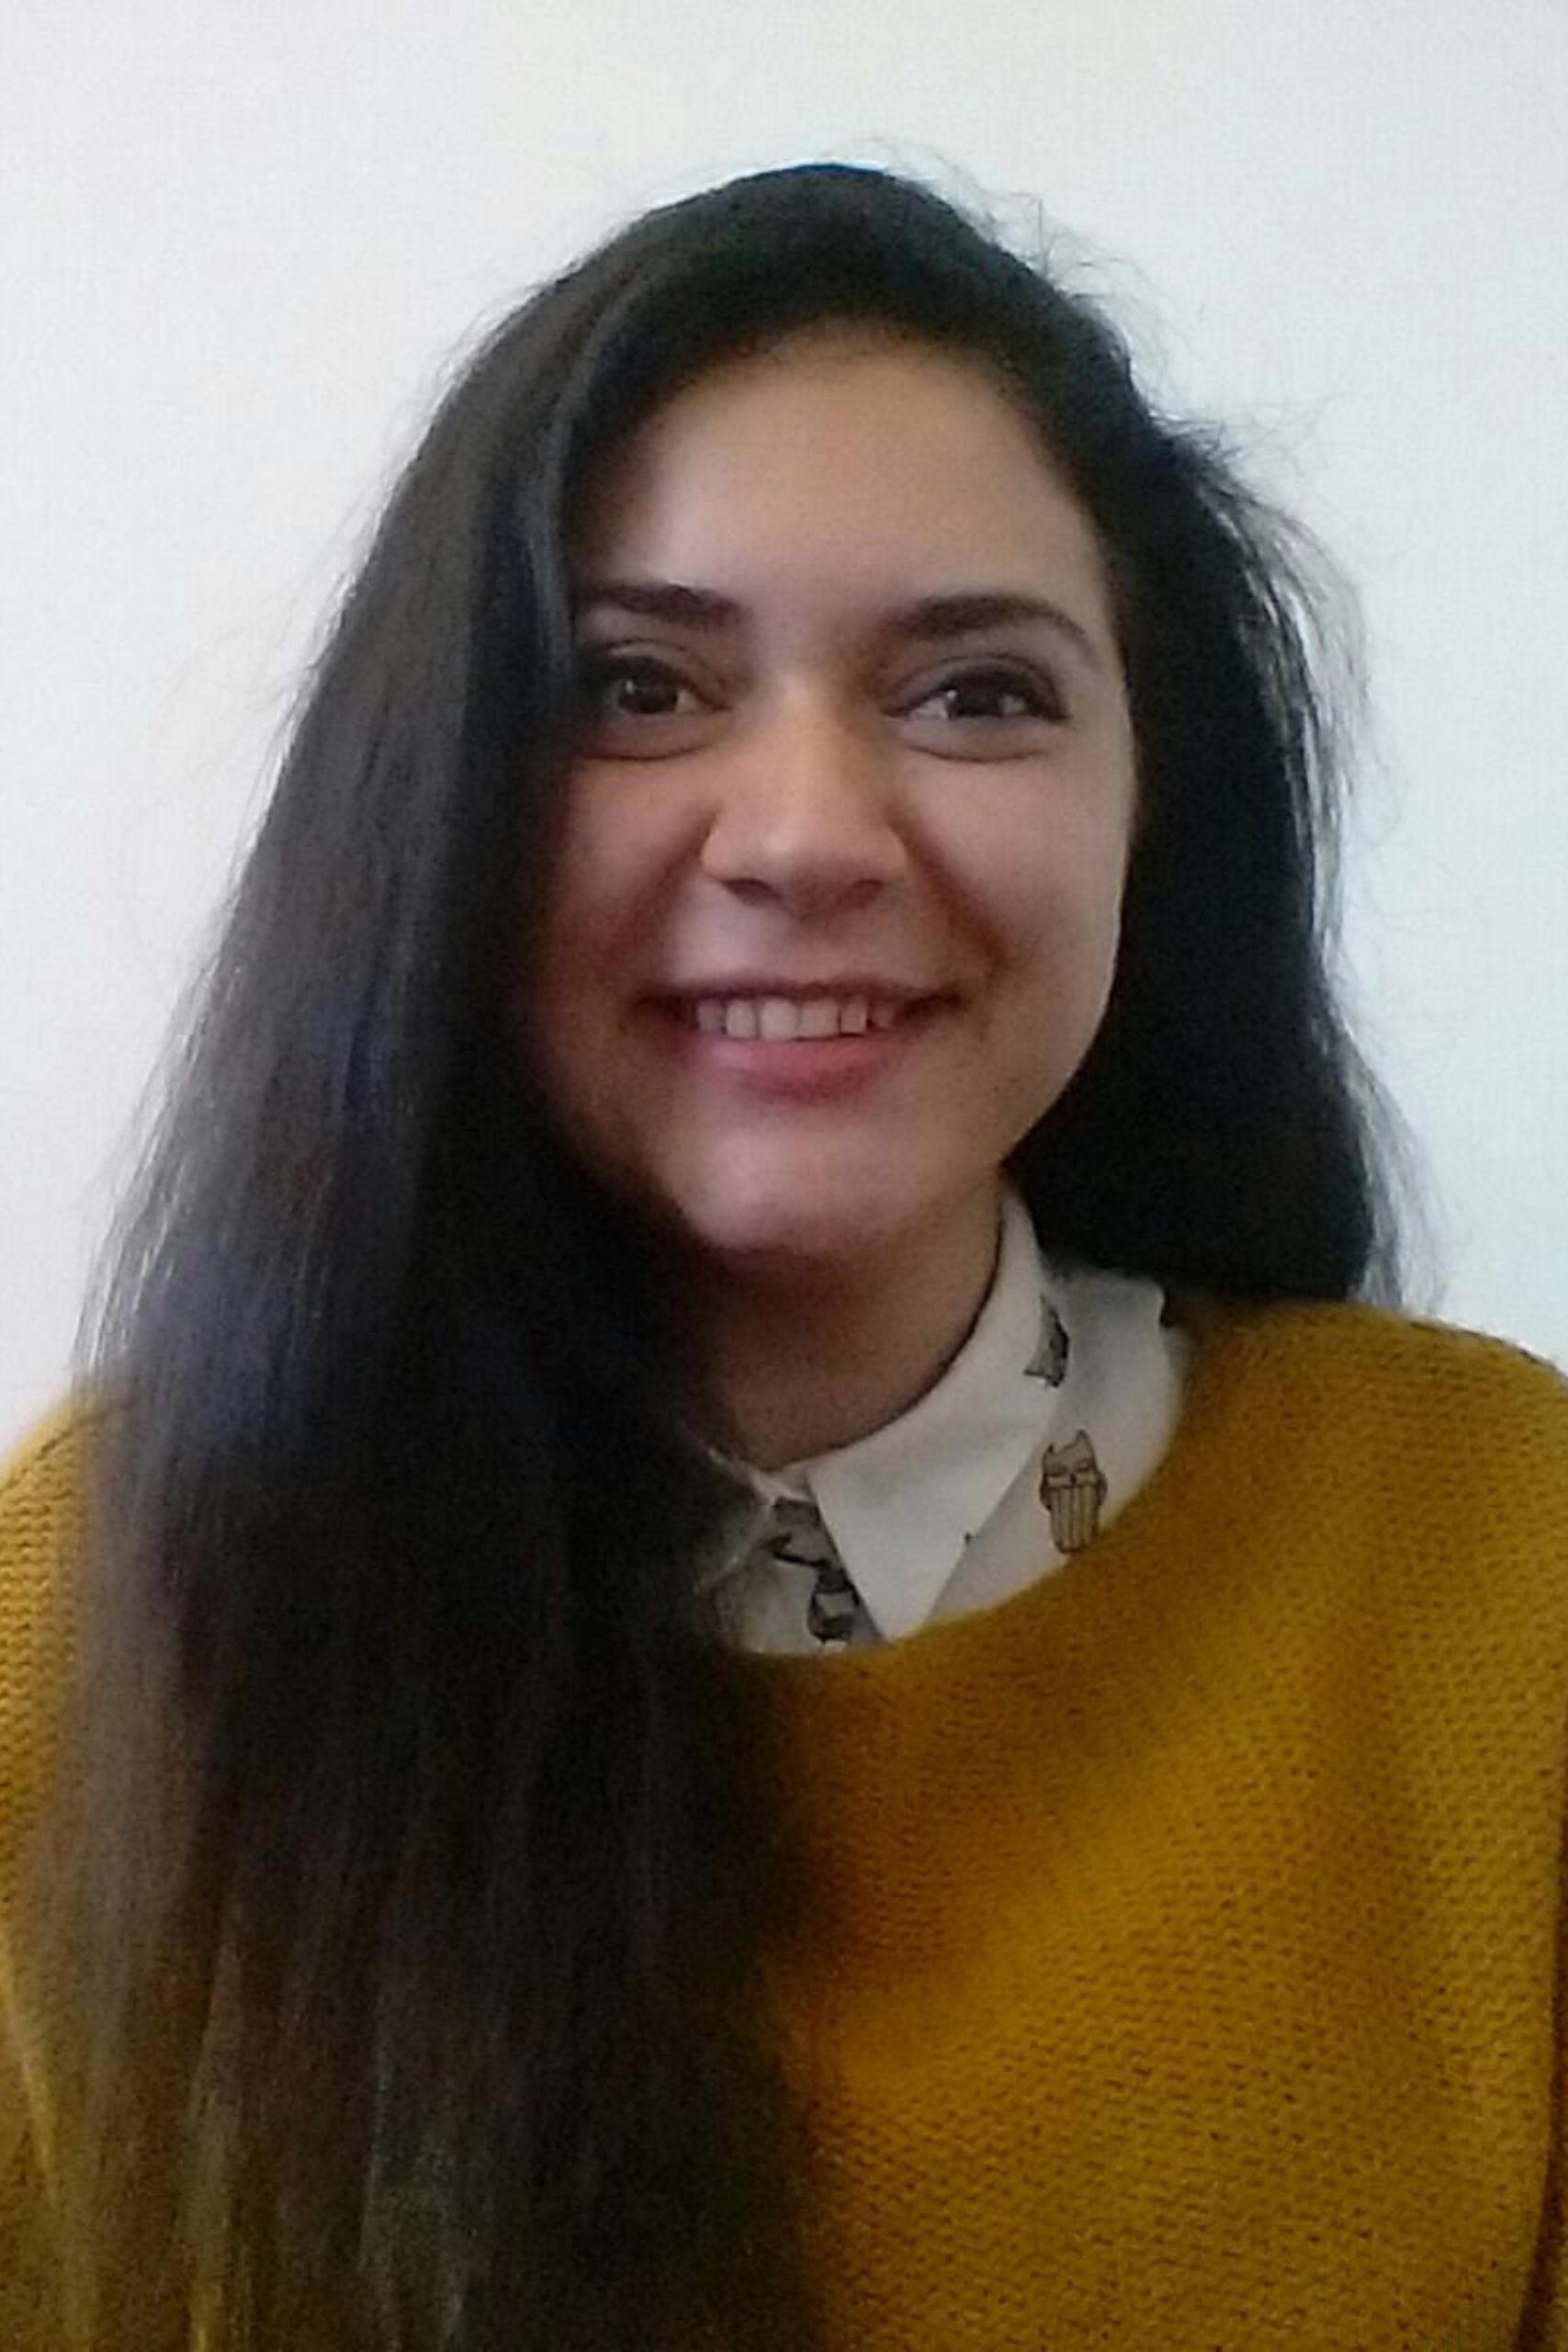 Maral Mamaghani